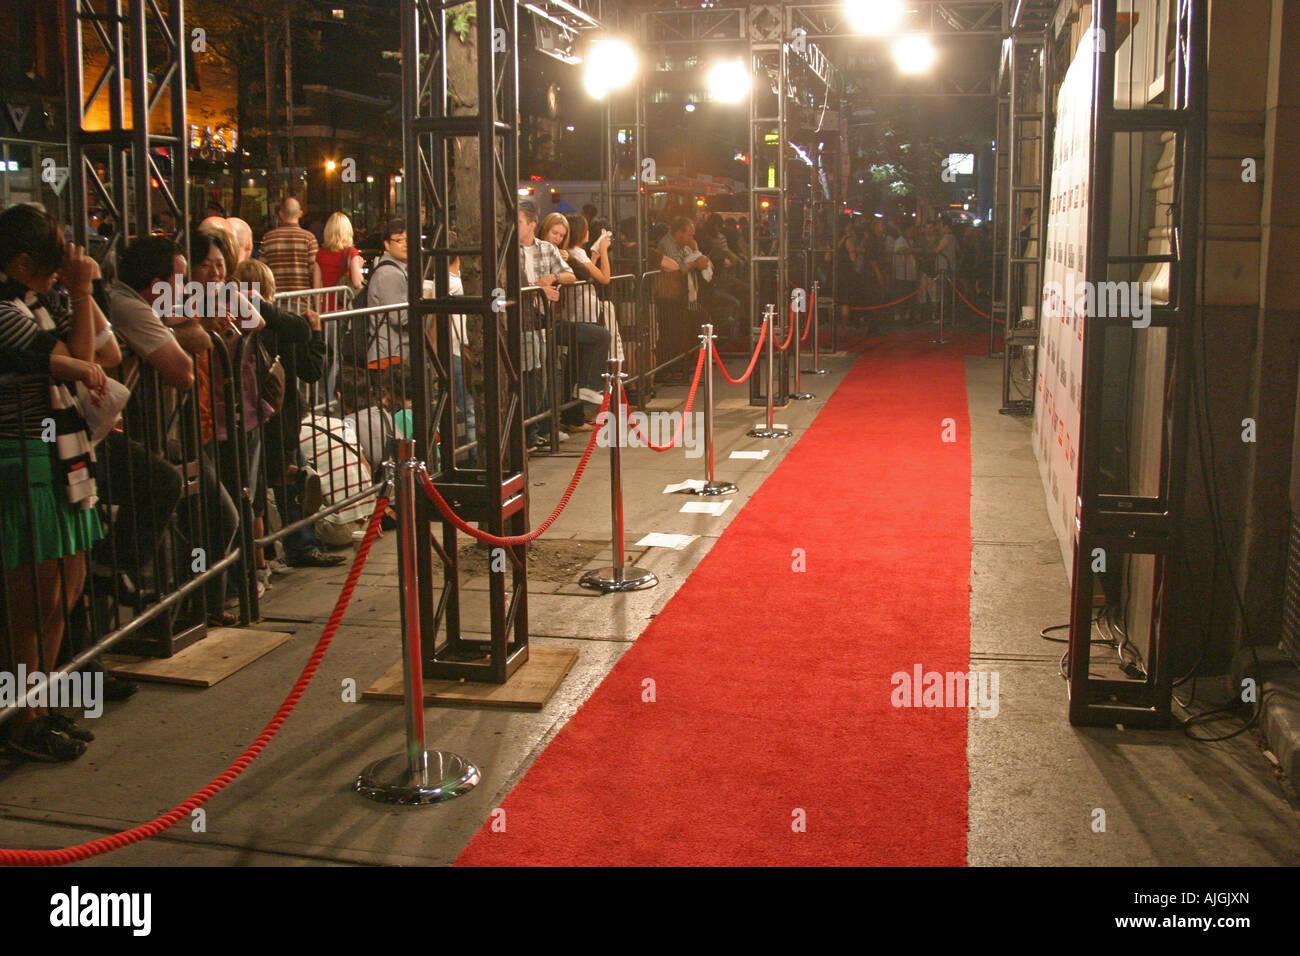 red carpet celebrity walkway - Stock Image